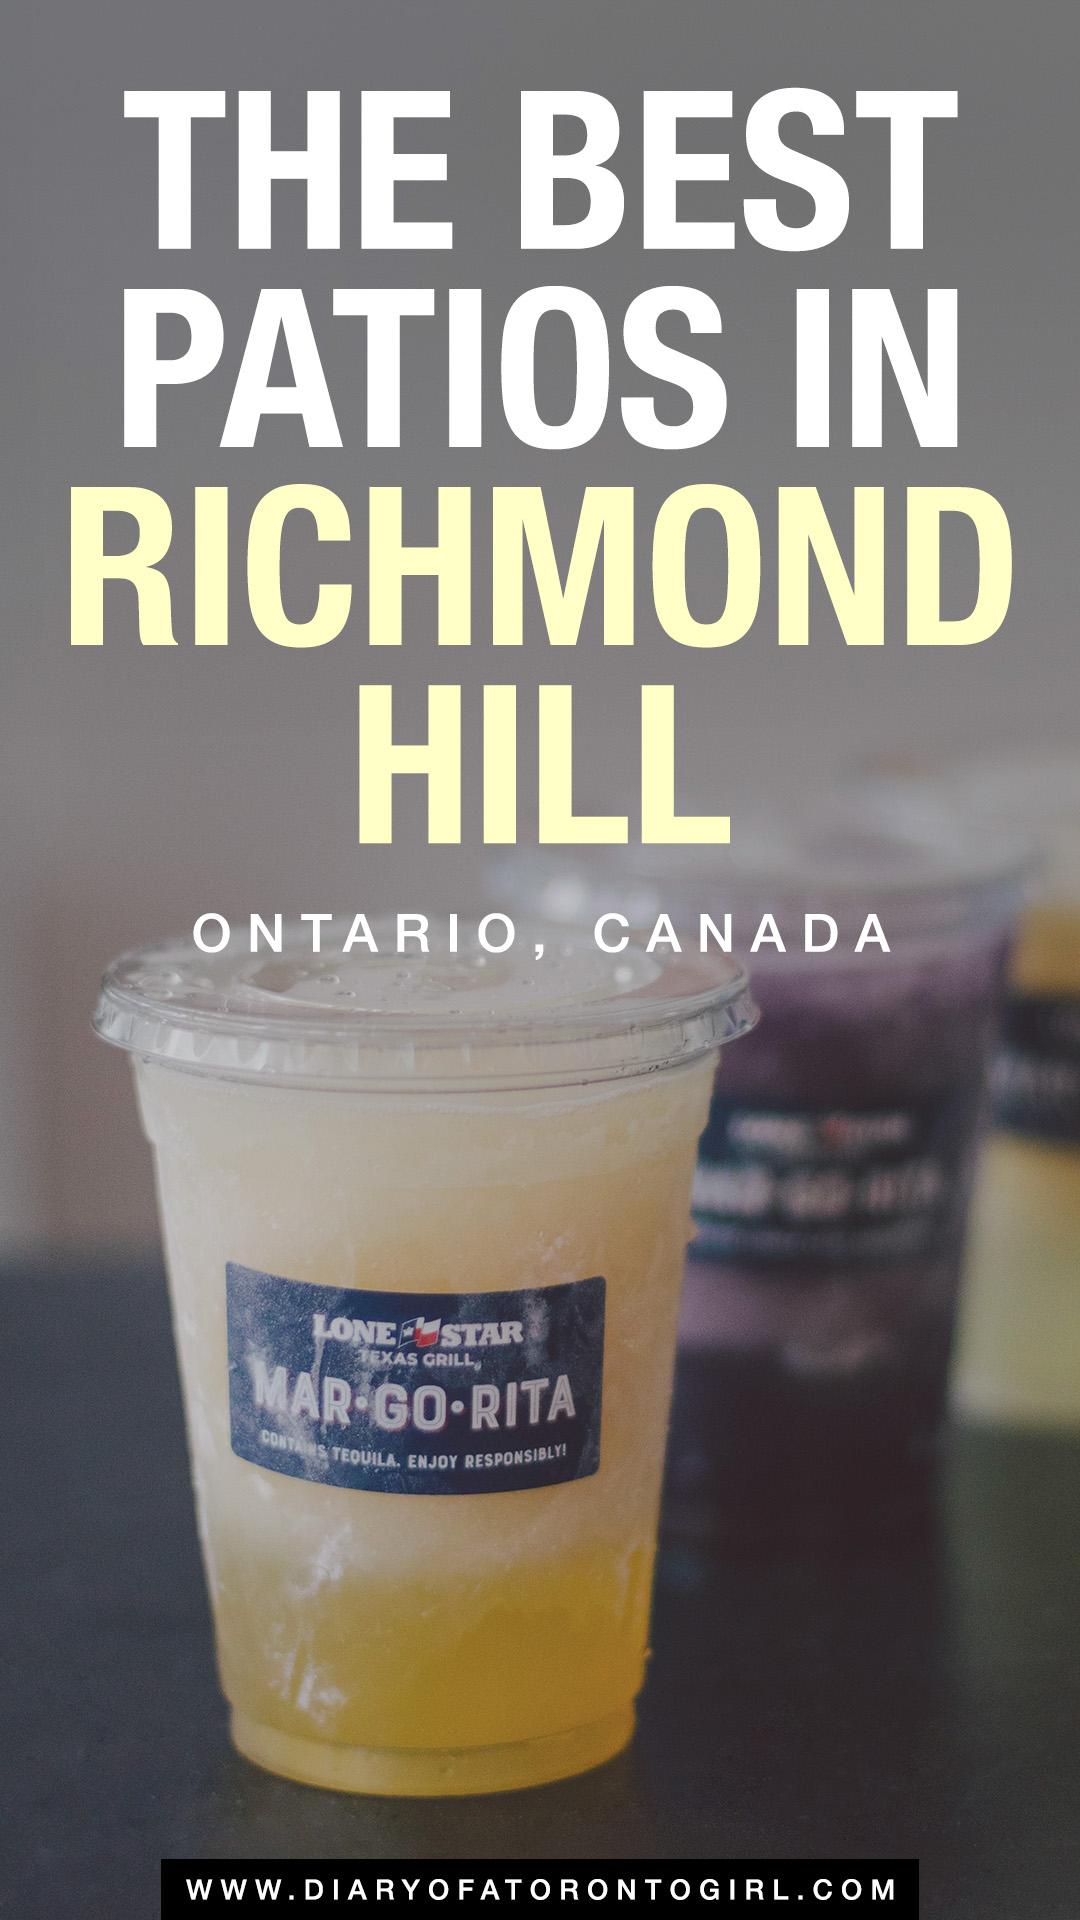 Best patios in Richmond Hill